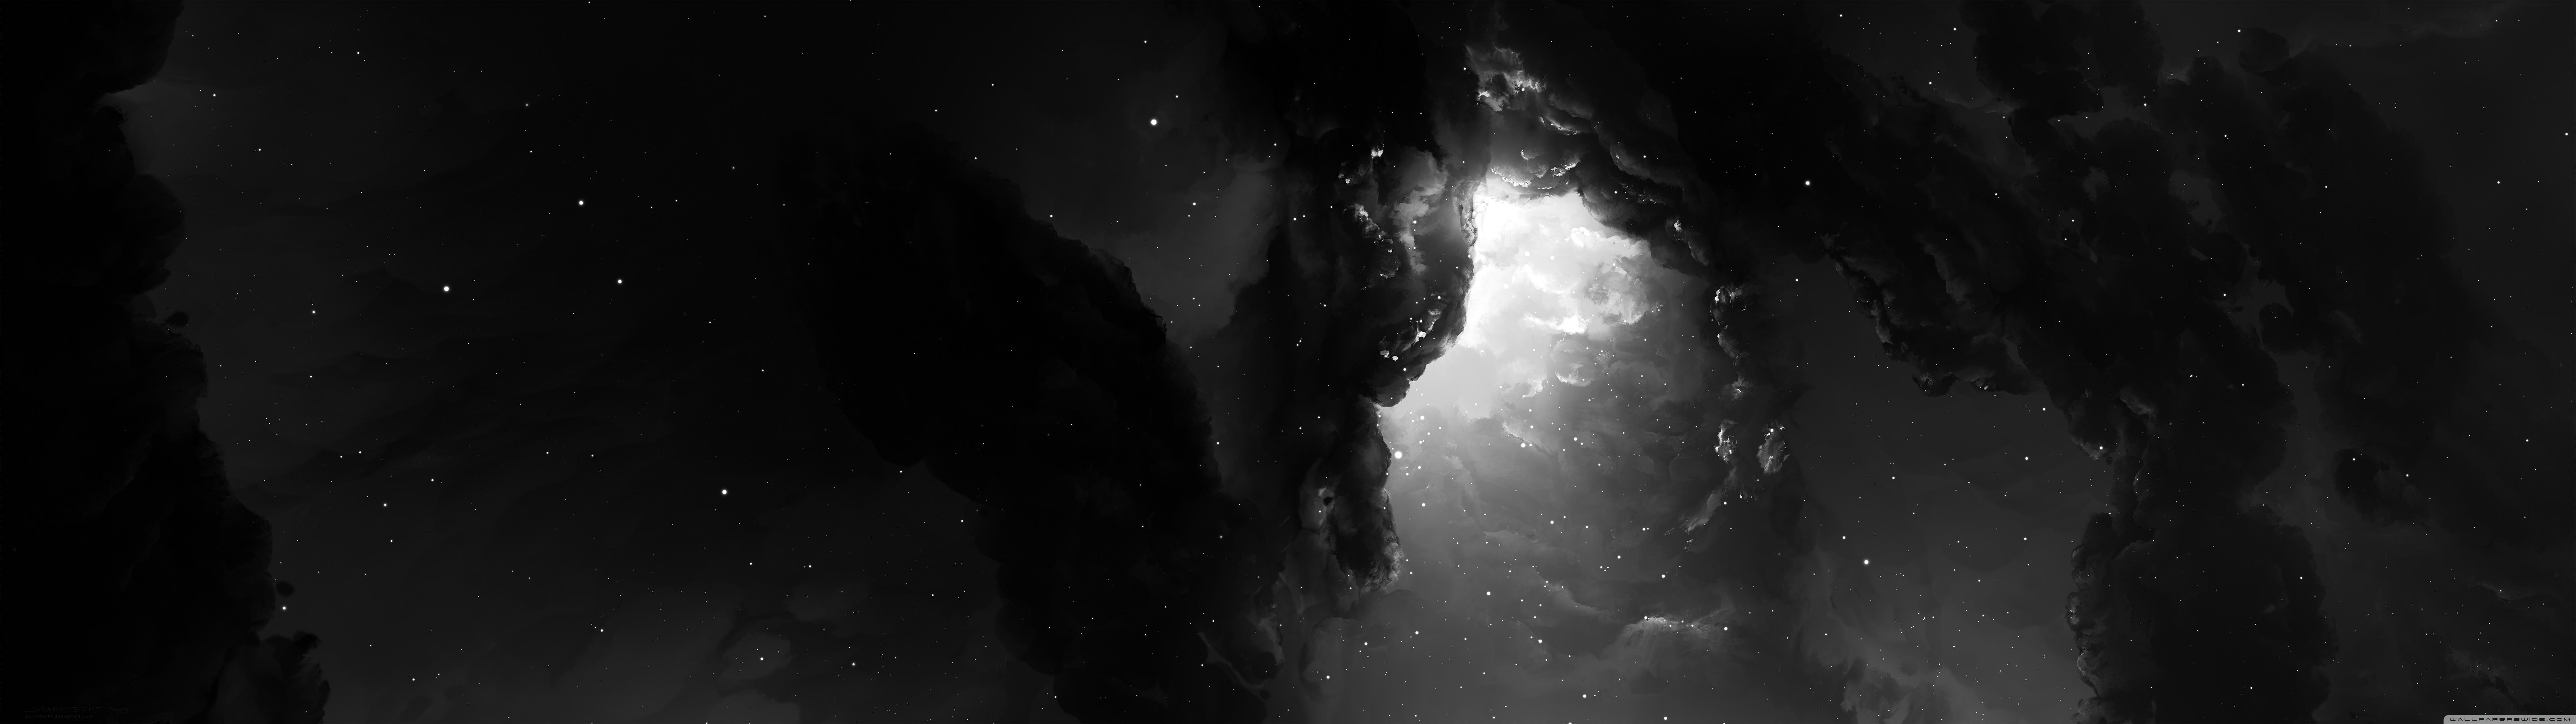 Dual Monitor Nebula Wallpaper Full HD [7680x2160] - Free wallpaper ...